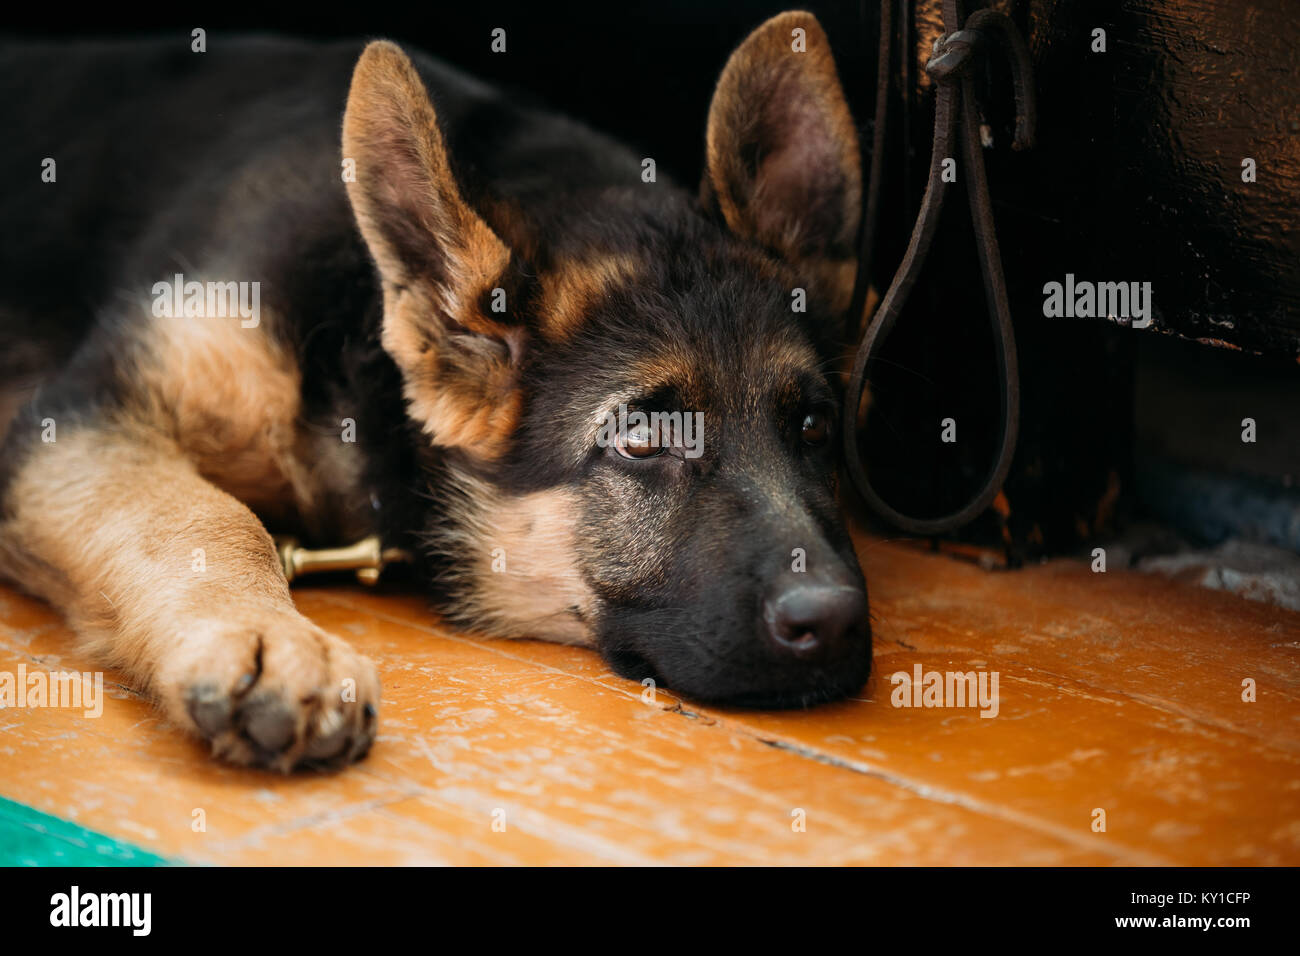 Sad German Shepherd Puppy Stock Photos Sad German Shepherd Puppy